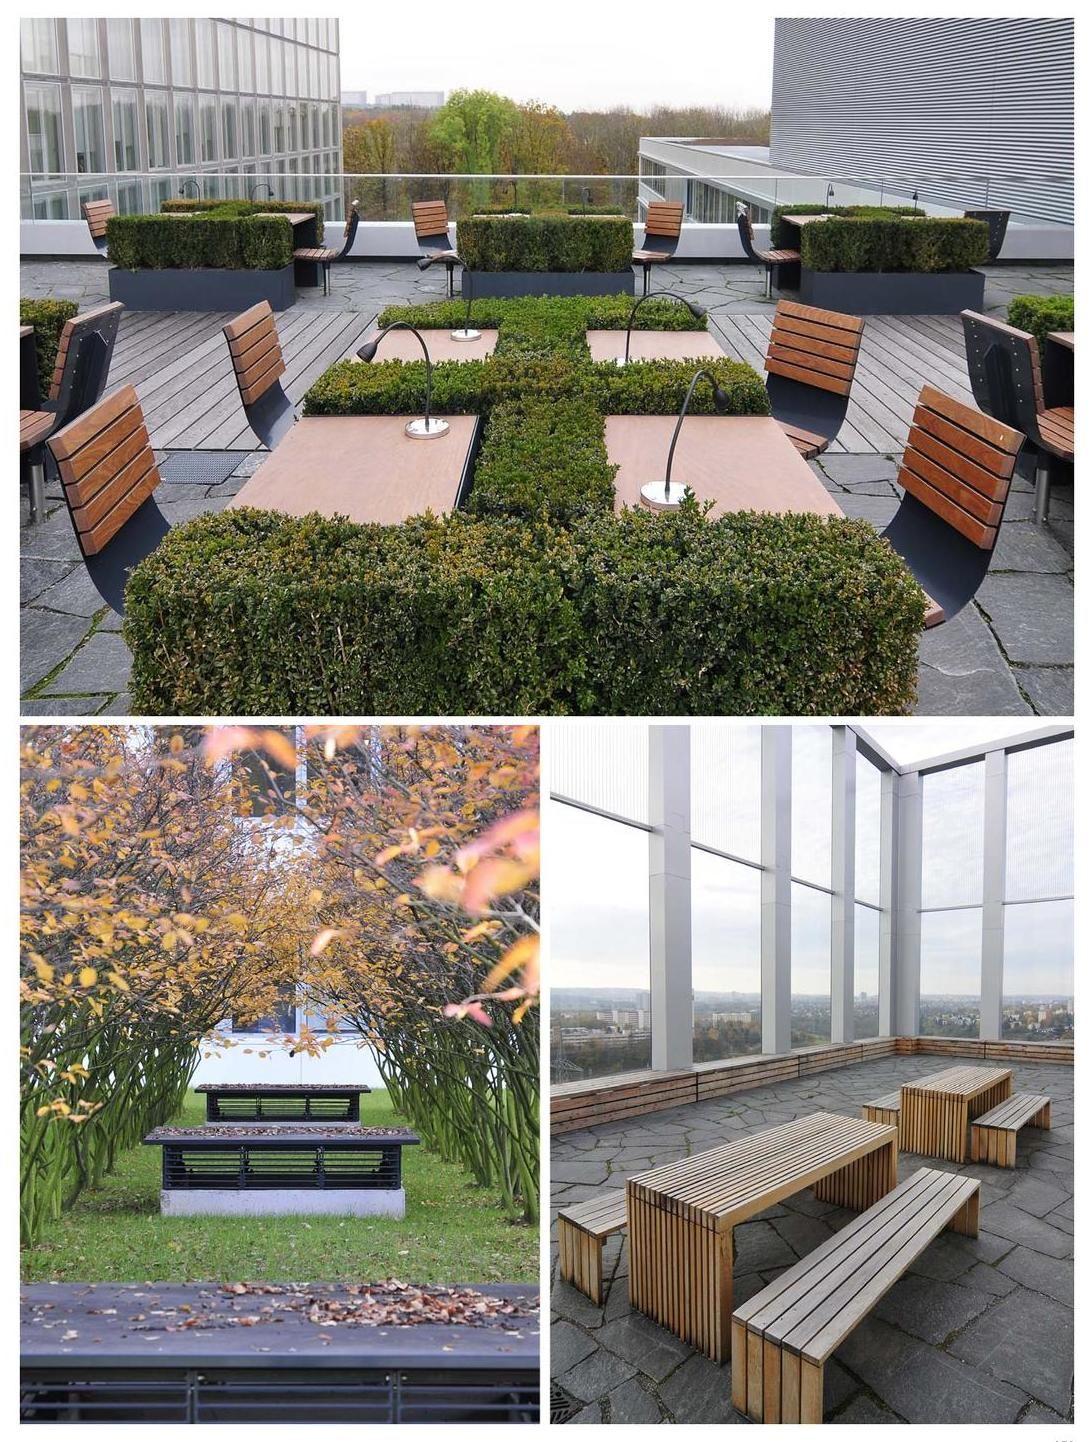 Corporate Commercial Landscape Rooftop Patio Urban Courtyards Landscape Design